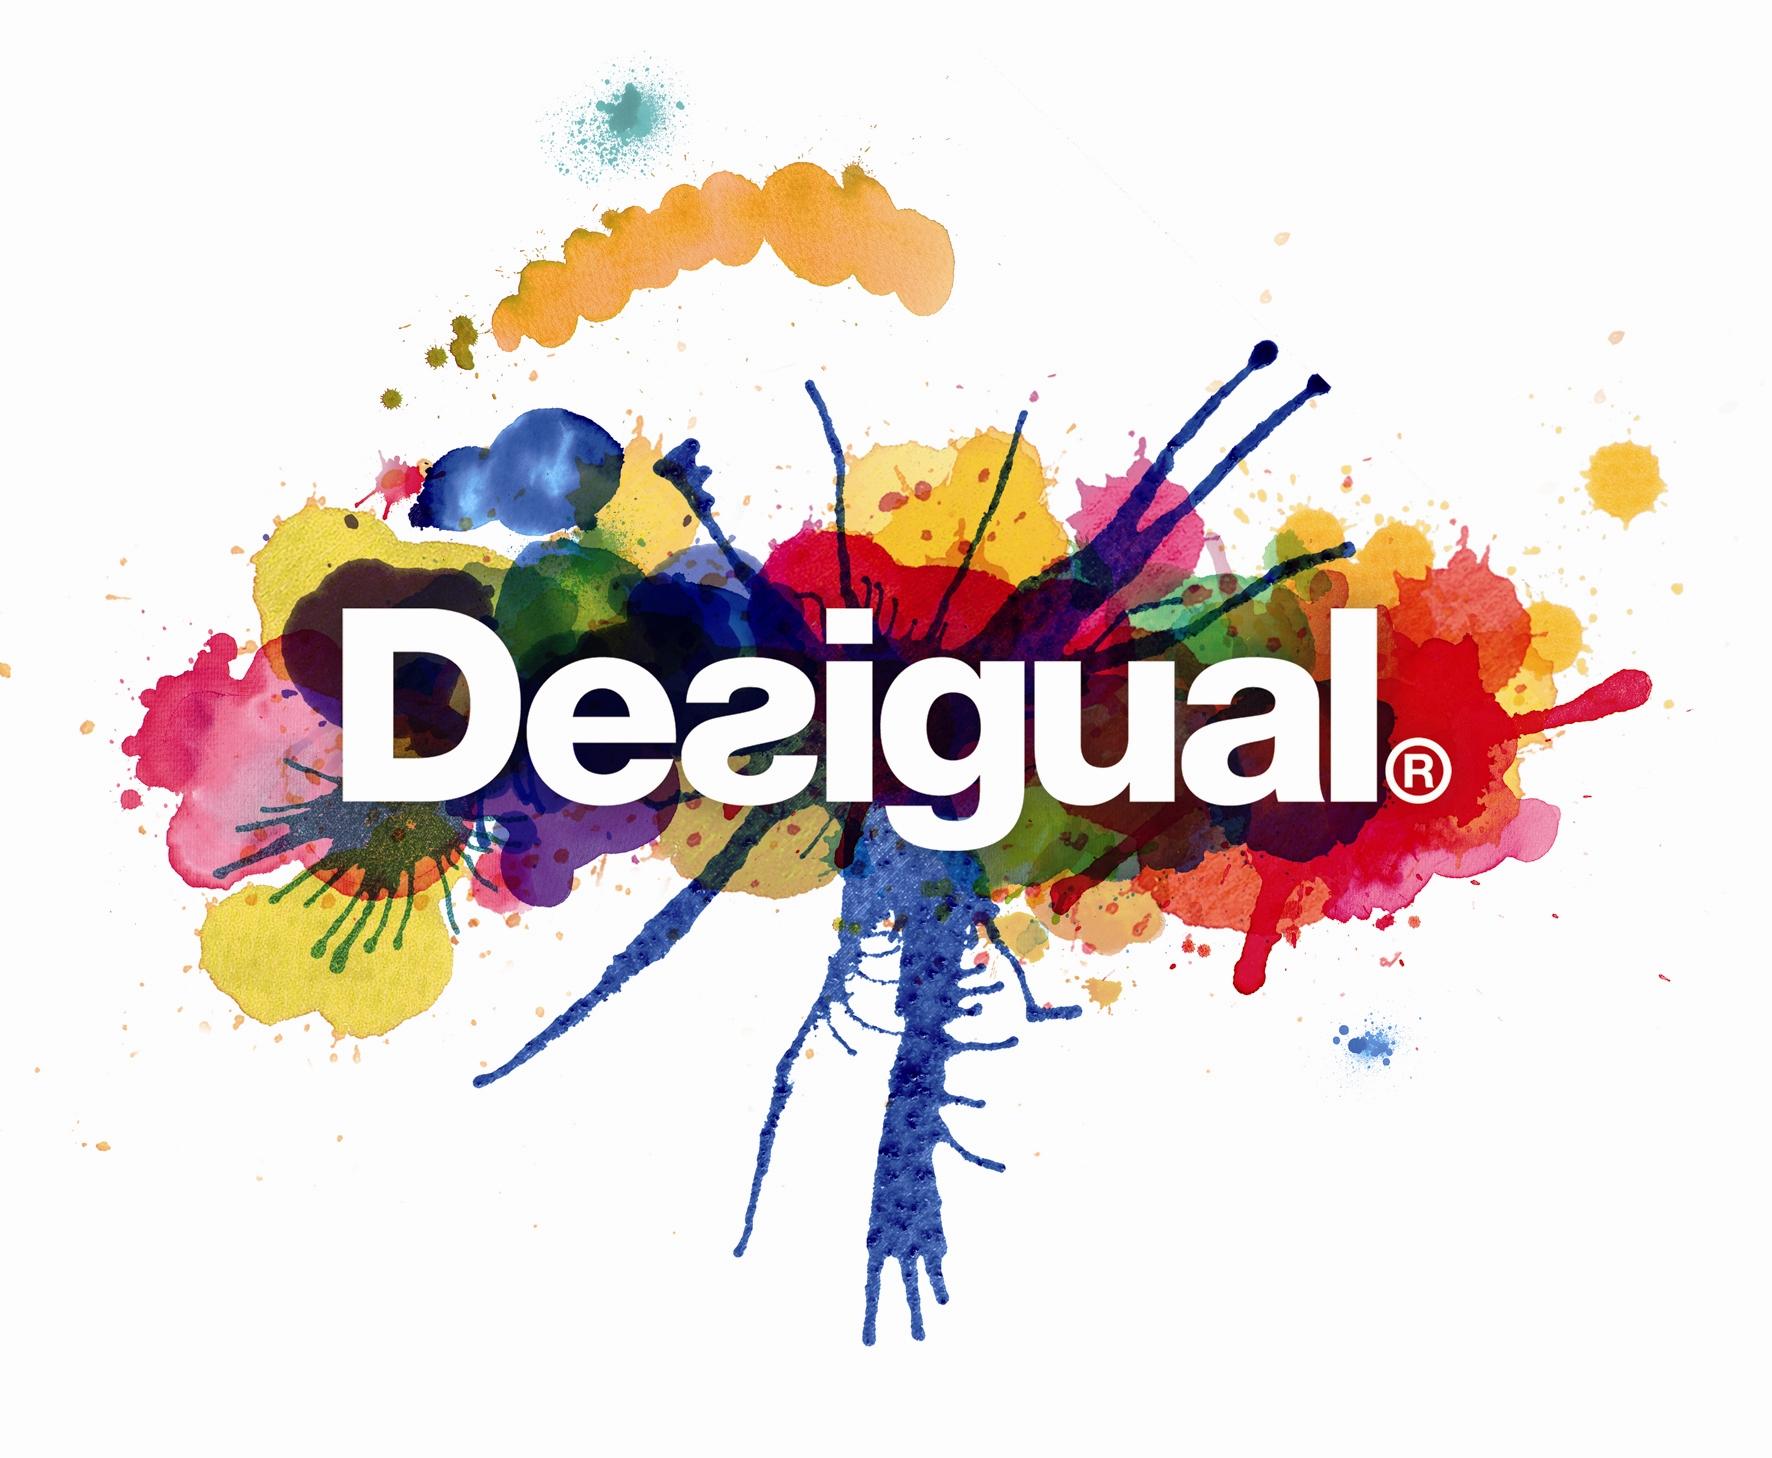 Spanish Fashion Designer Desigual